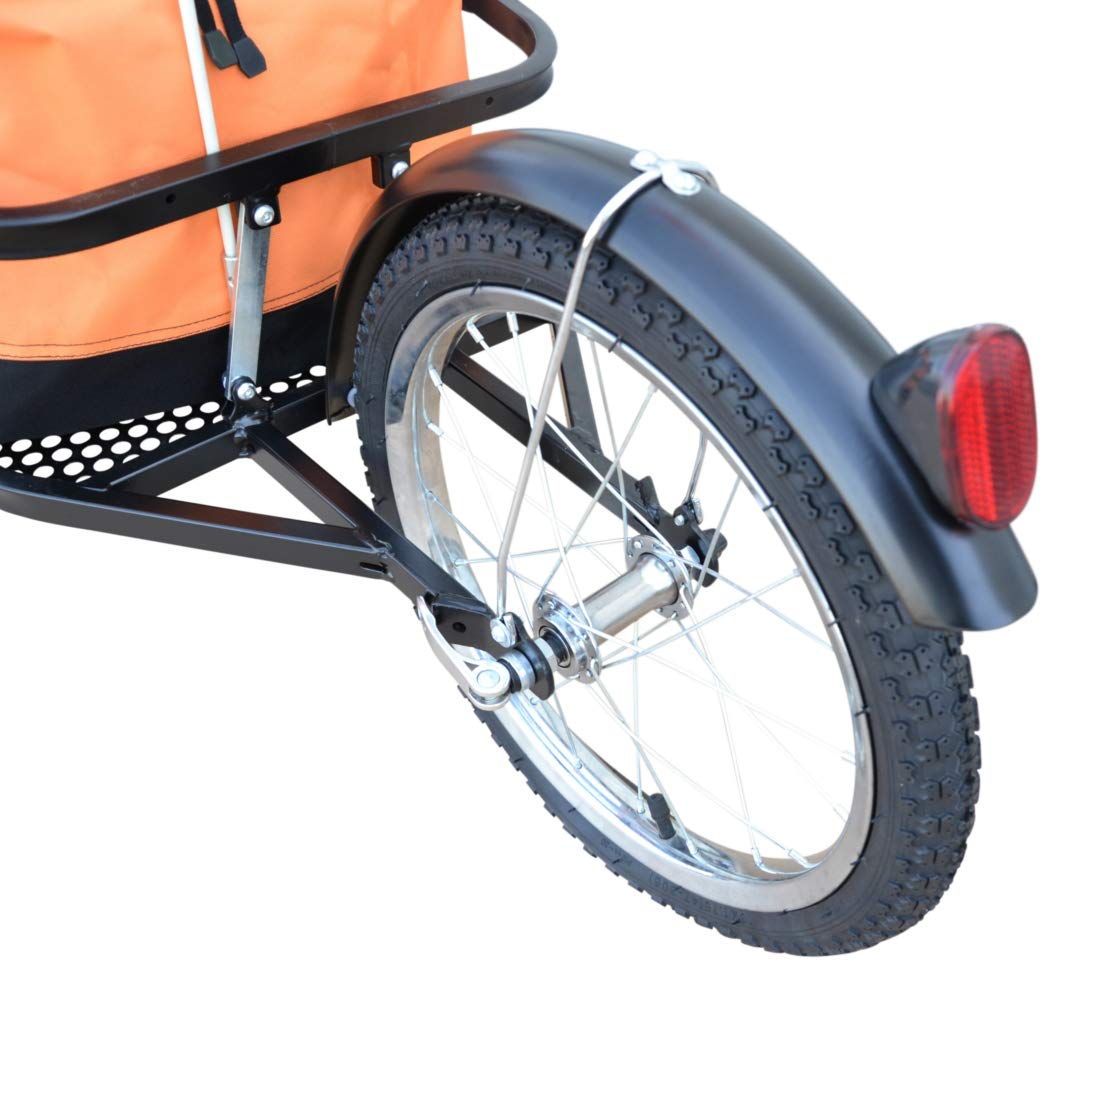 Polironeshop Vector fahrradanh/änger lastenanh/änger einrad anh/änger gep/äckanh/änger mit Tasche